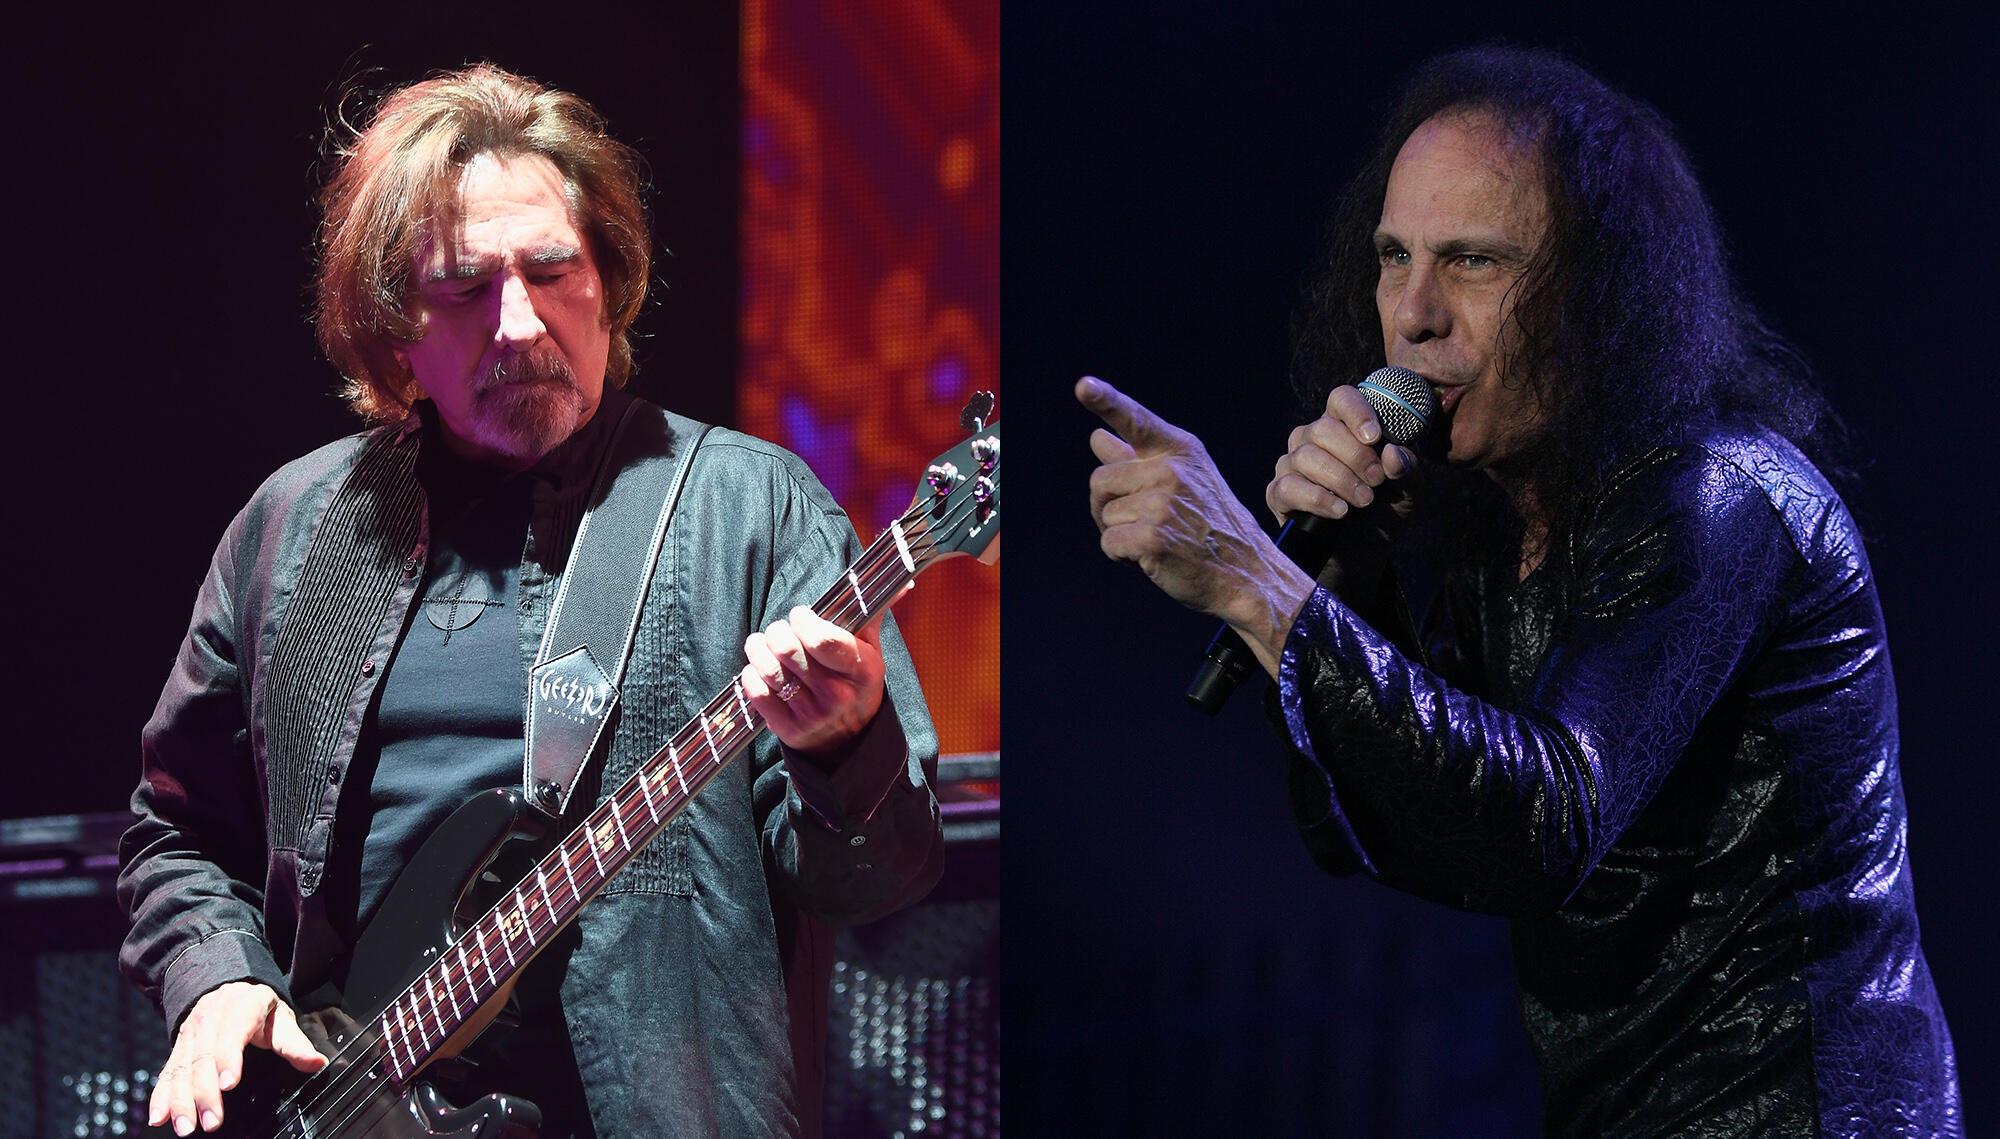 Black Sabbath's Only Request Of Dio On Second LP: 'No Rainbows, No Dragons'